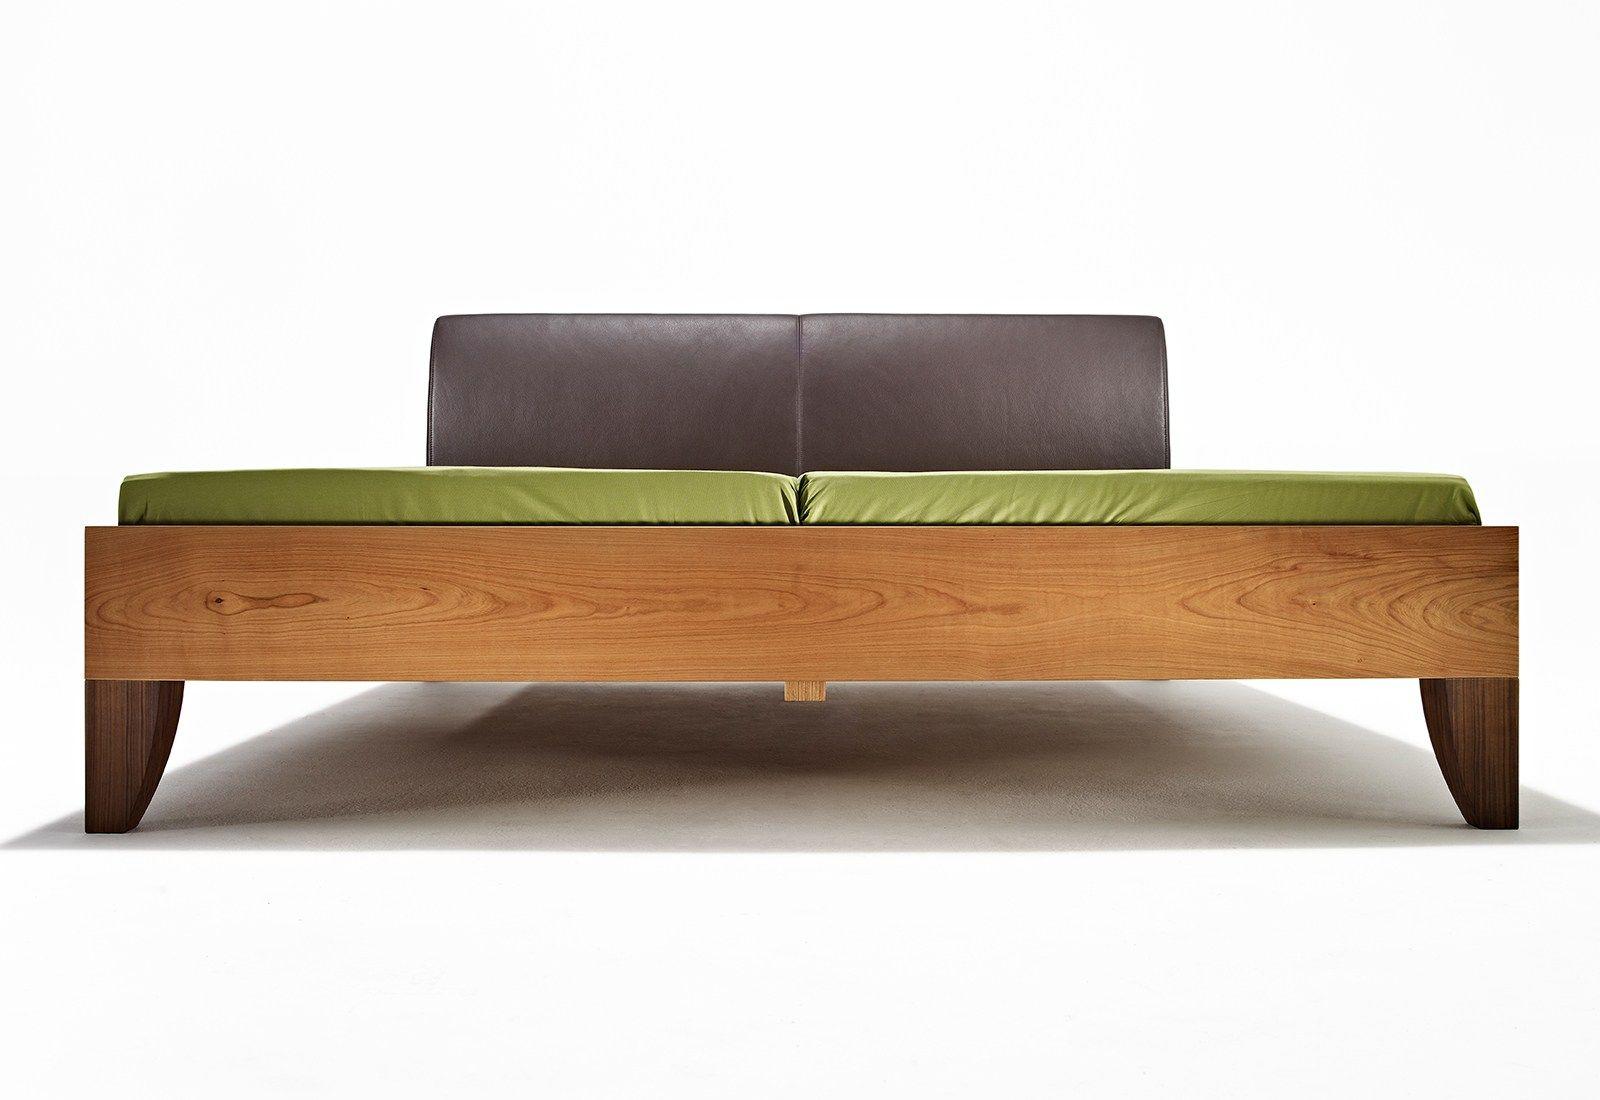 Mamma bett mit polsterkopfteil by sixay furniture design lászló ...